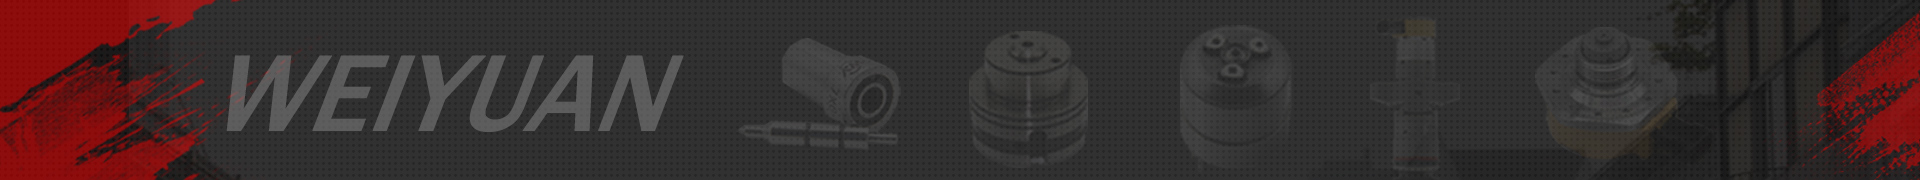 Dong Gang WeiYuan Fuel Injection Equipment co.ltd